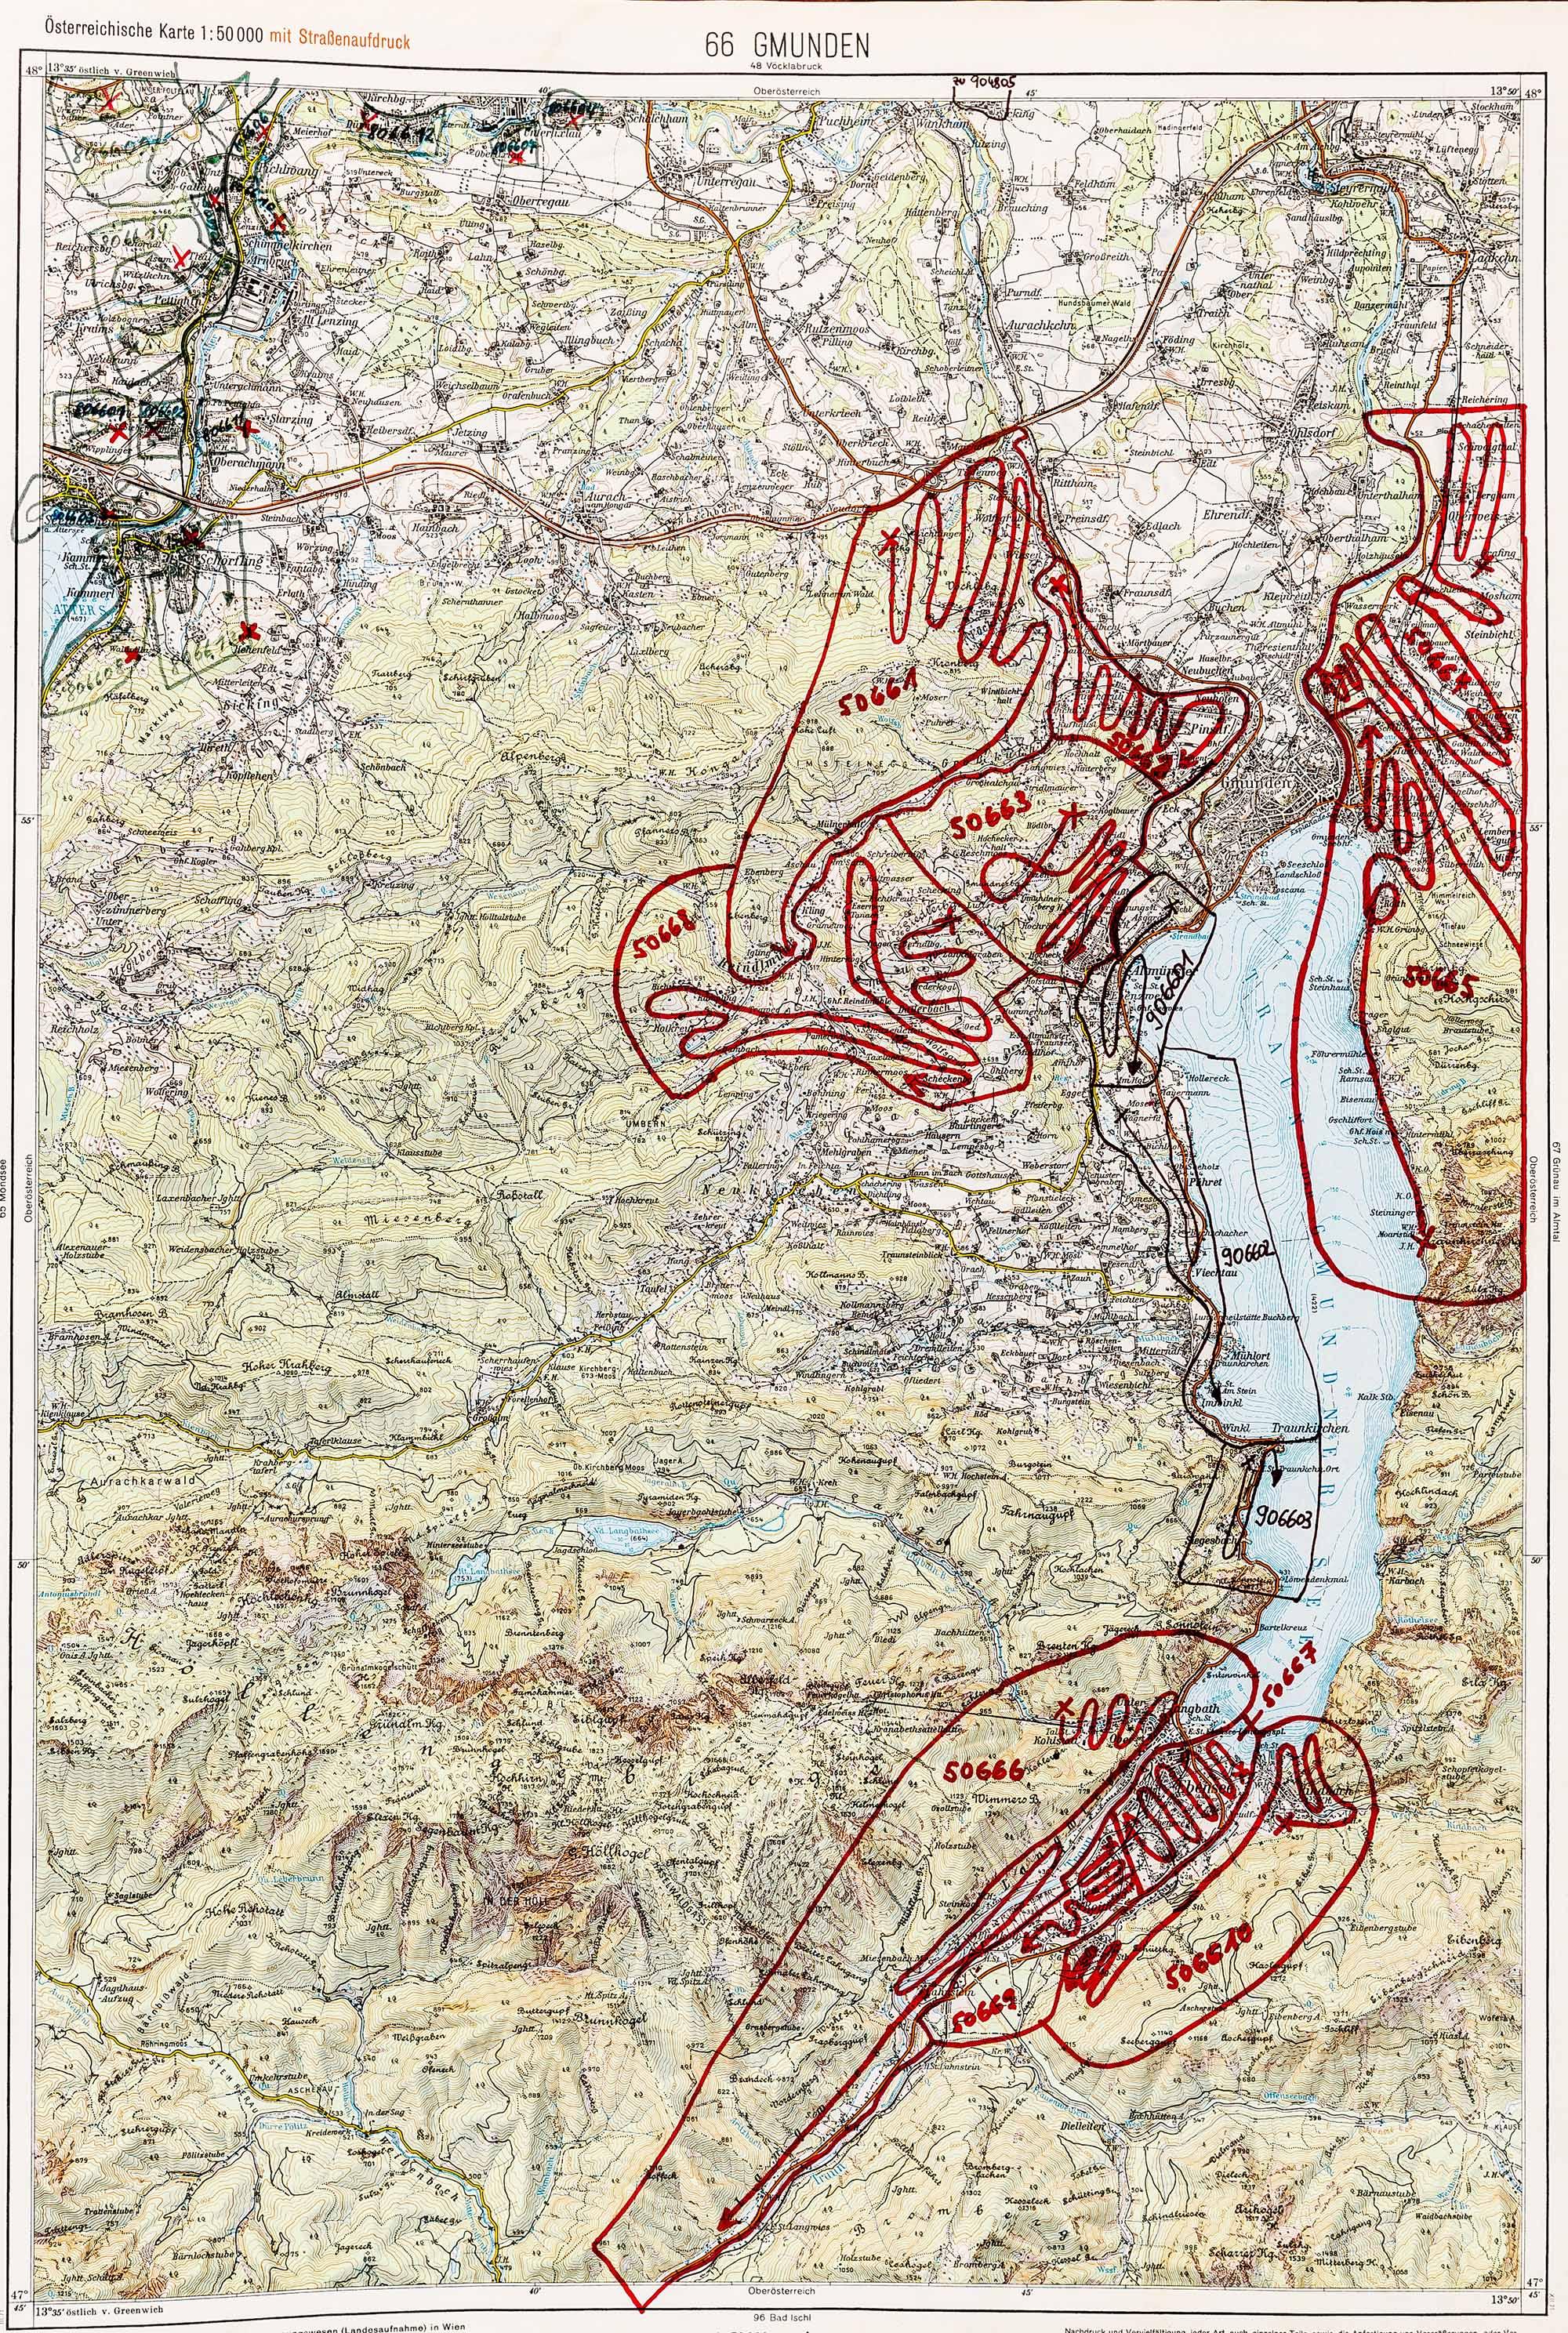 1975-1979 Karte 066